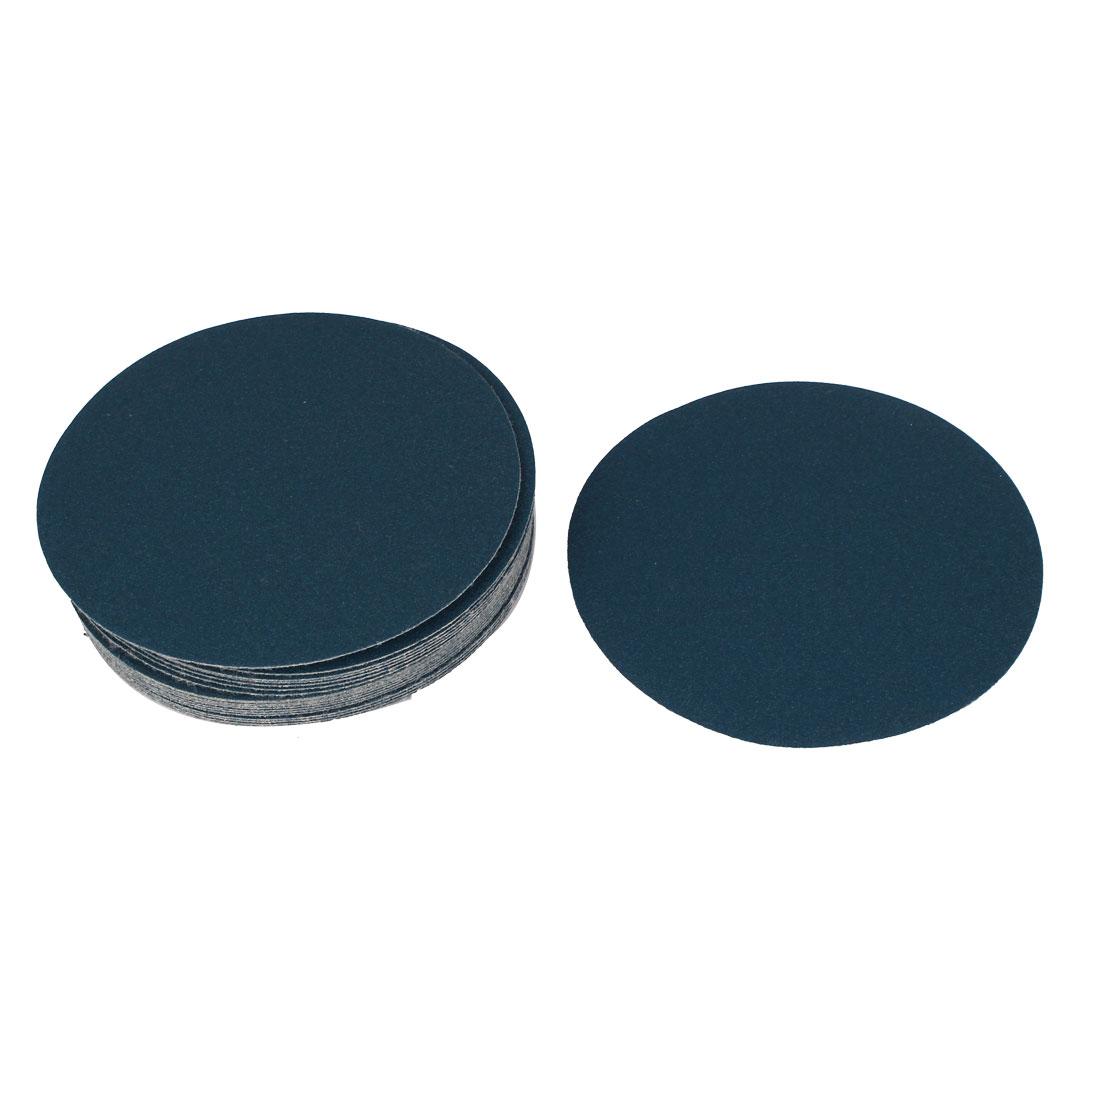 "5"" Dia Polishing Round Abrasive Sanding Sandpaper Sheet Disc 150 Grit 20 Pcs"